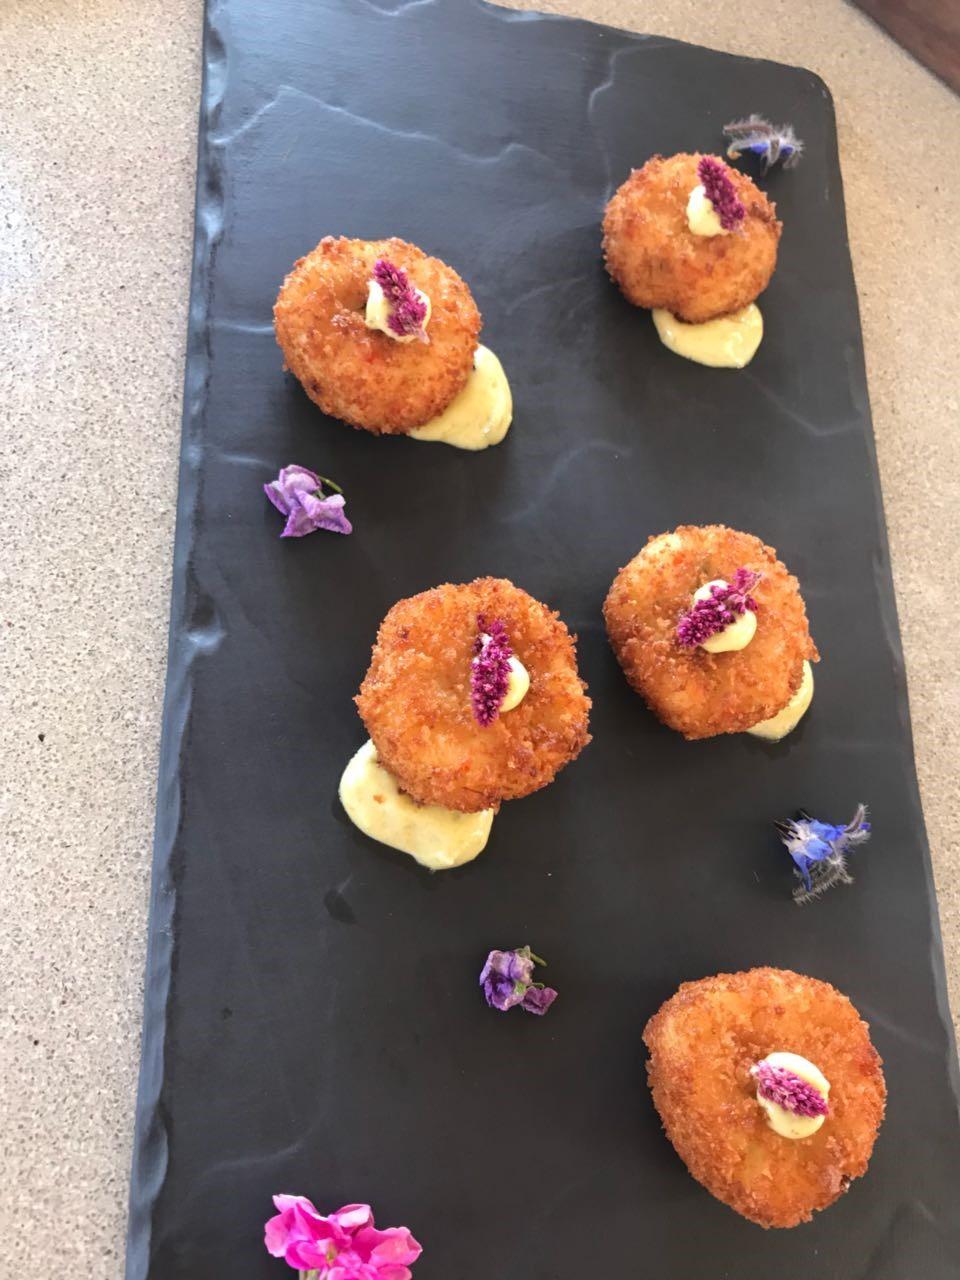 hors d'oeuvres for weddings esperanza menu tasting